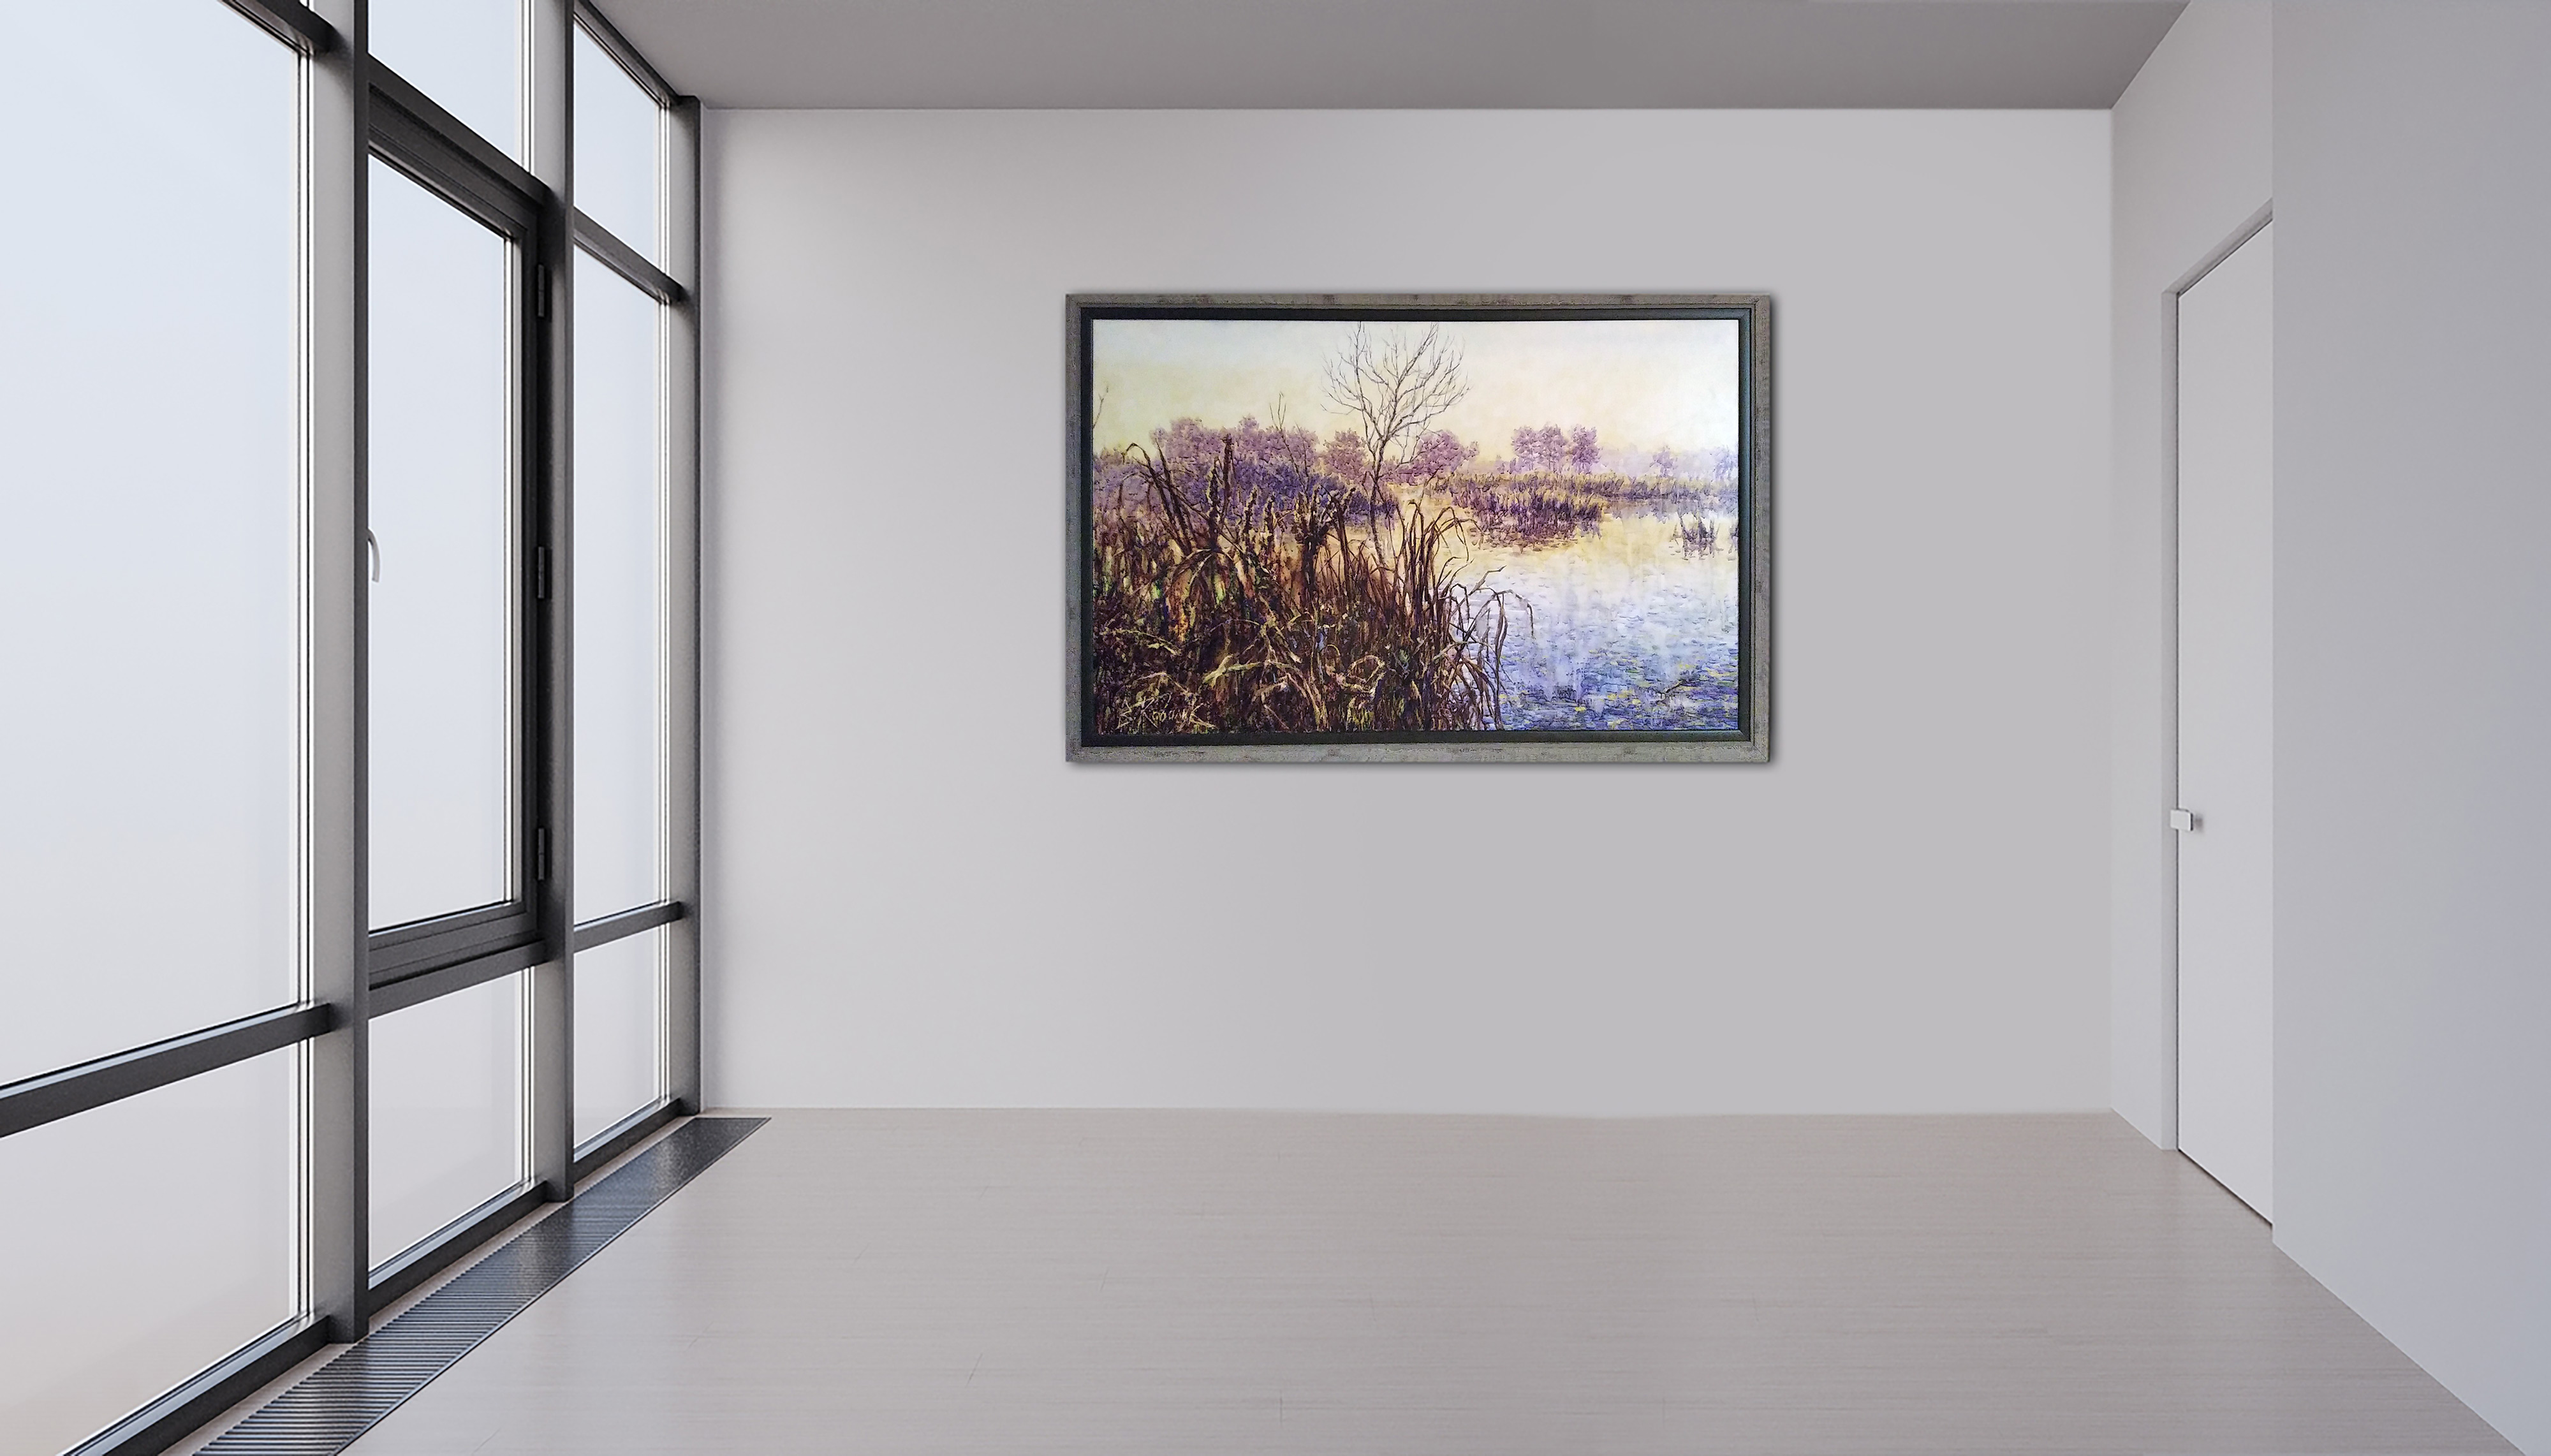 Herbstliche Motive, Leinen, Aquarell, Öl, Pigment, Lack, 126x80 cm